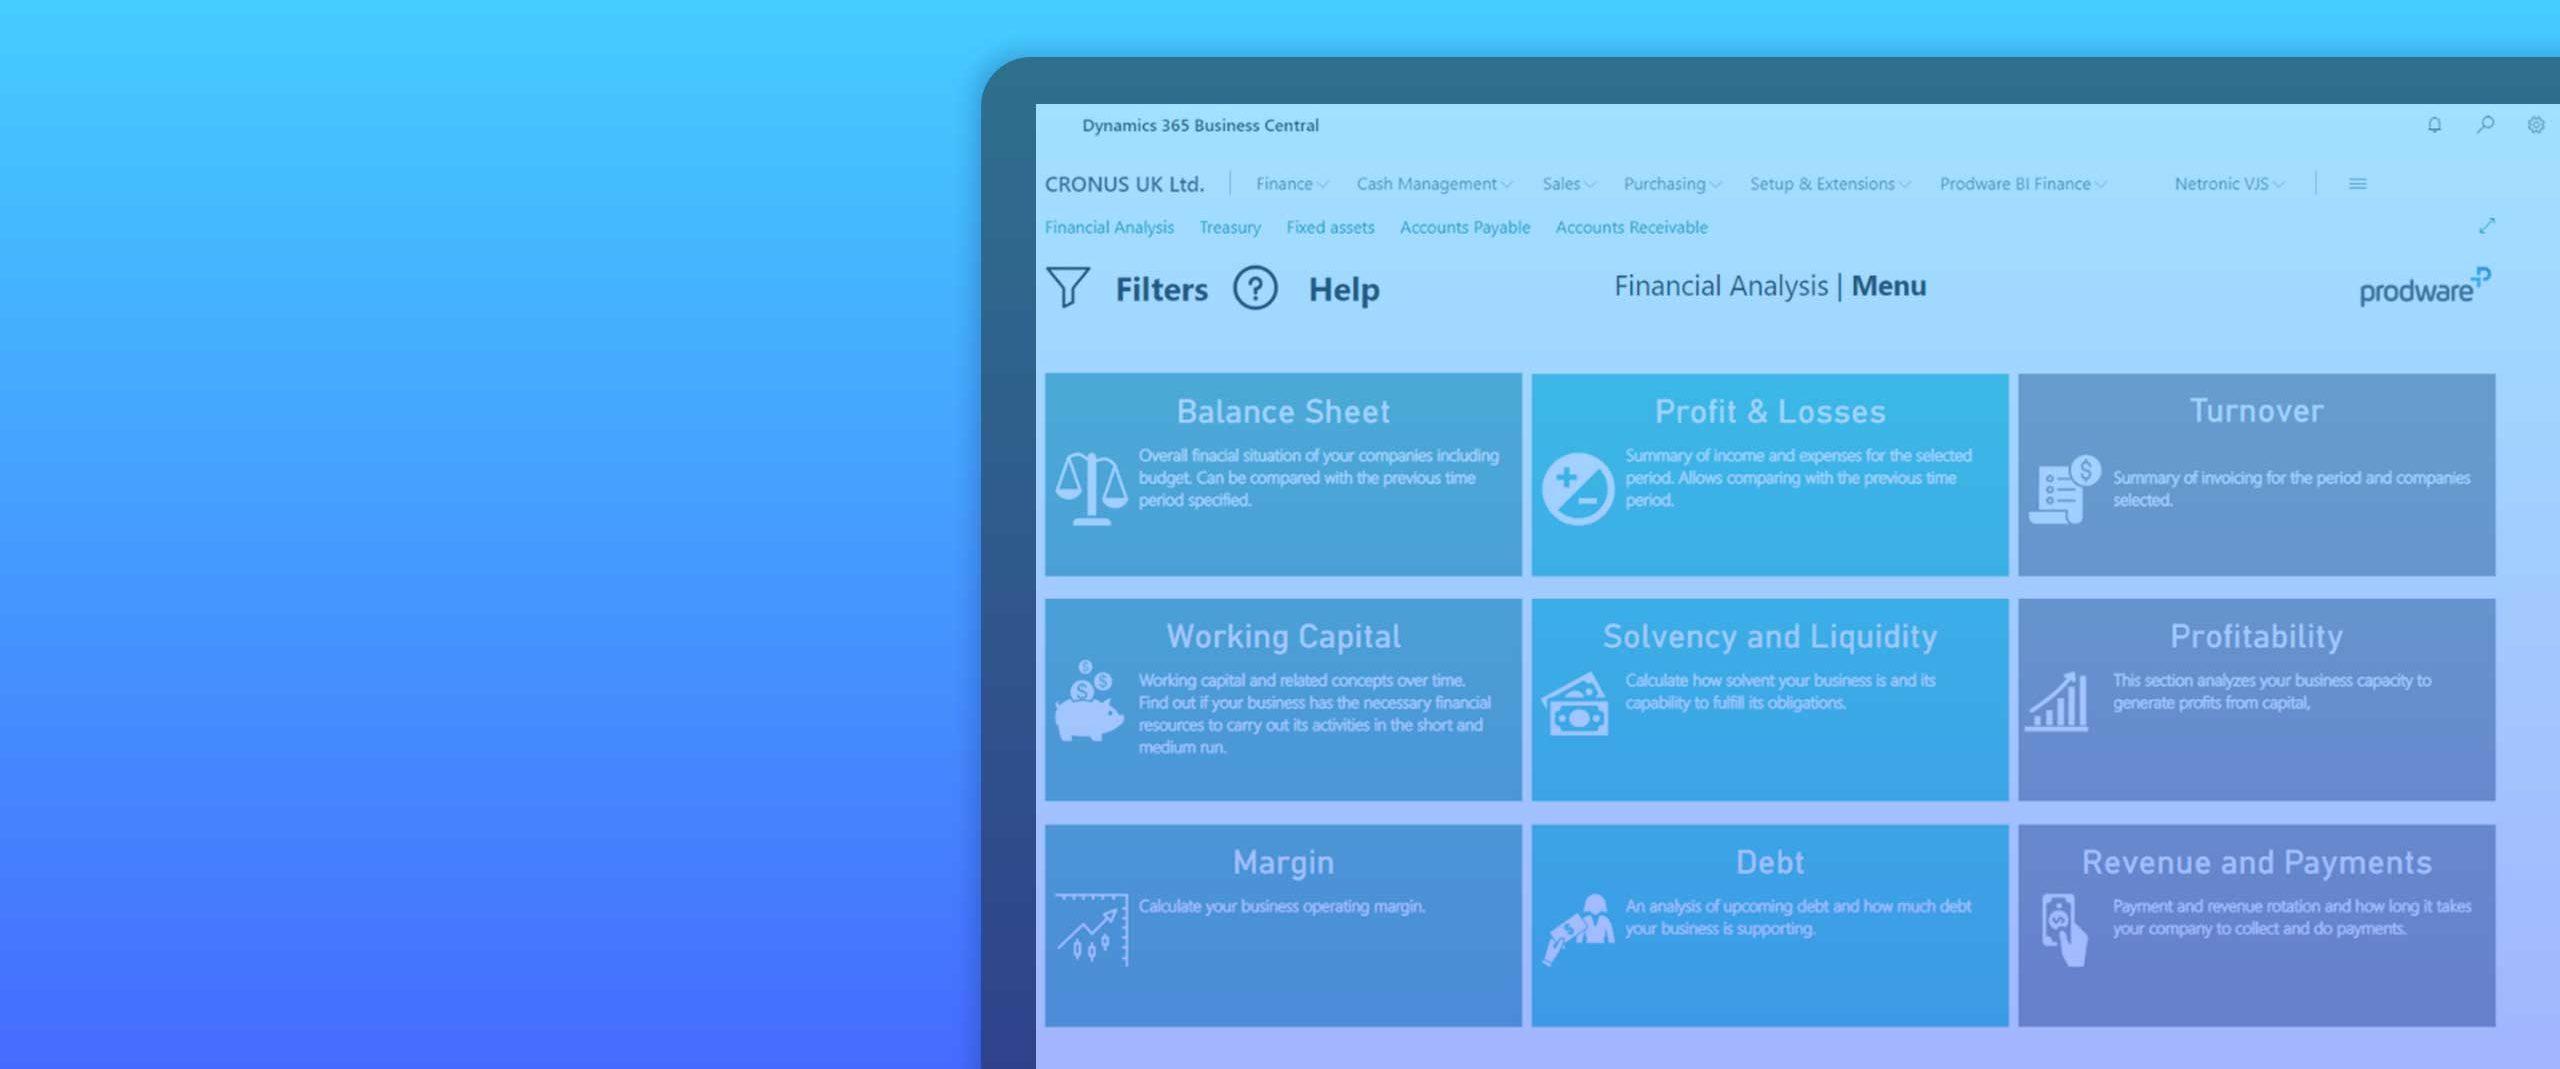 Power BI for Microsoft Dynamics 365 Business Central